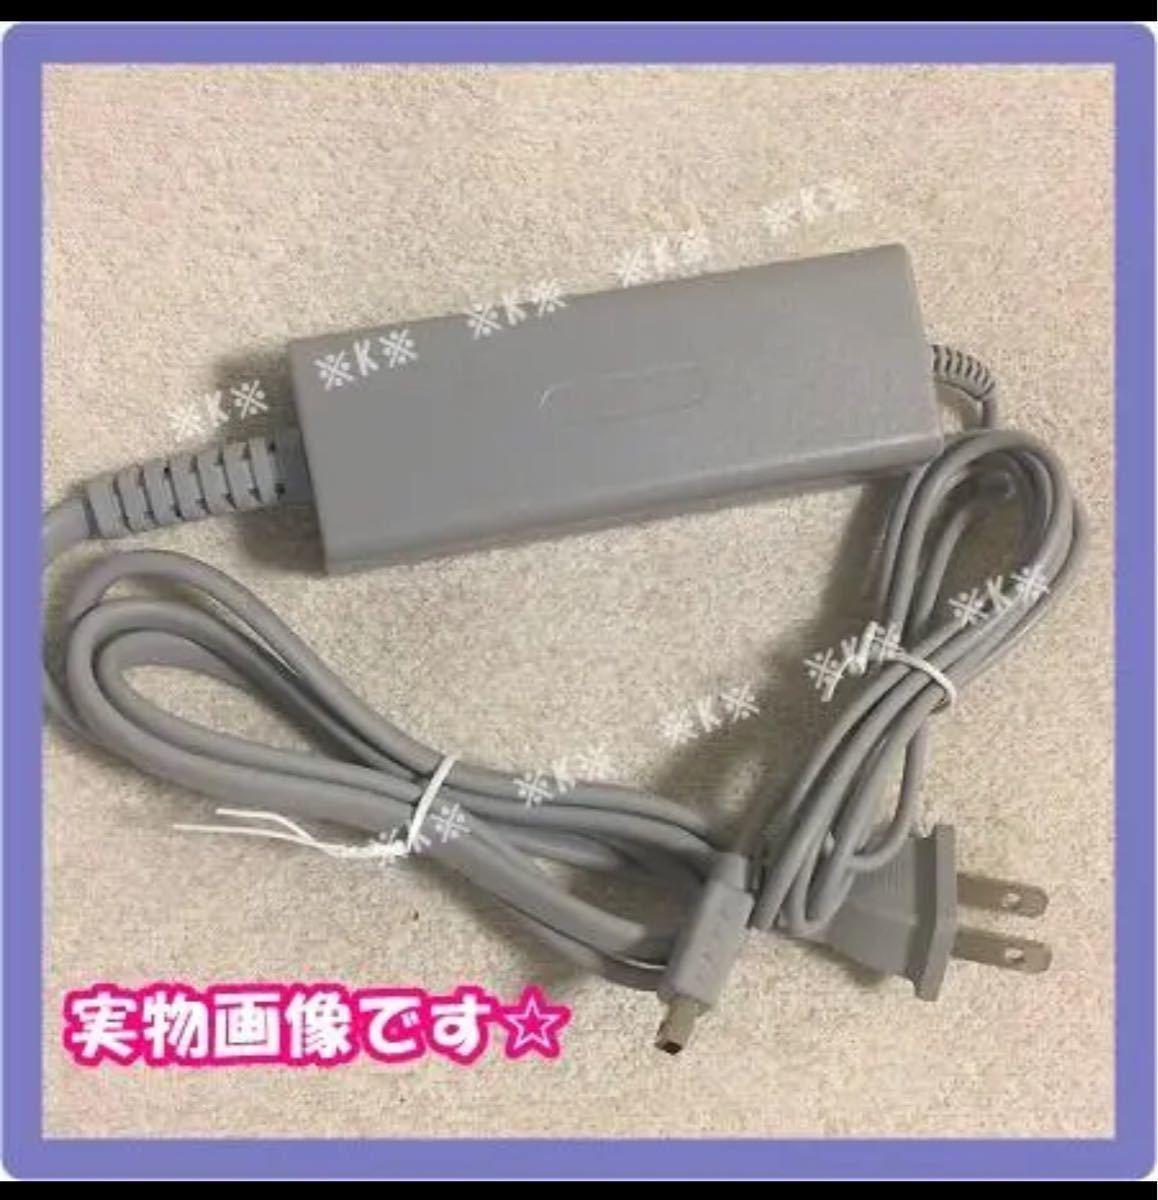 Wii U Game Pad ゲームパッド ACアダブター 充電器 互換